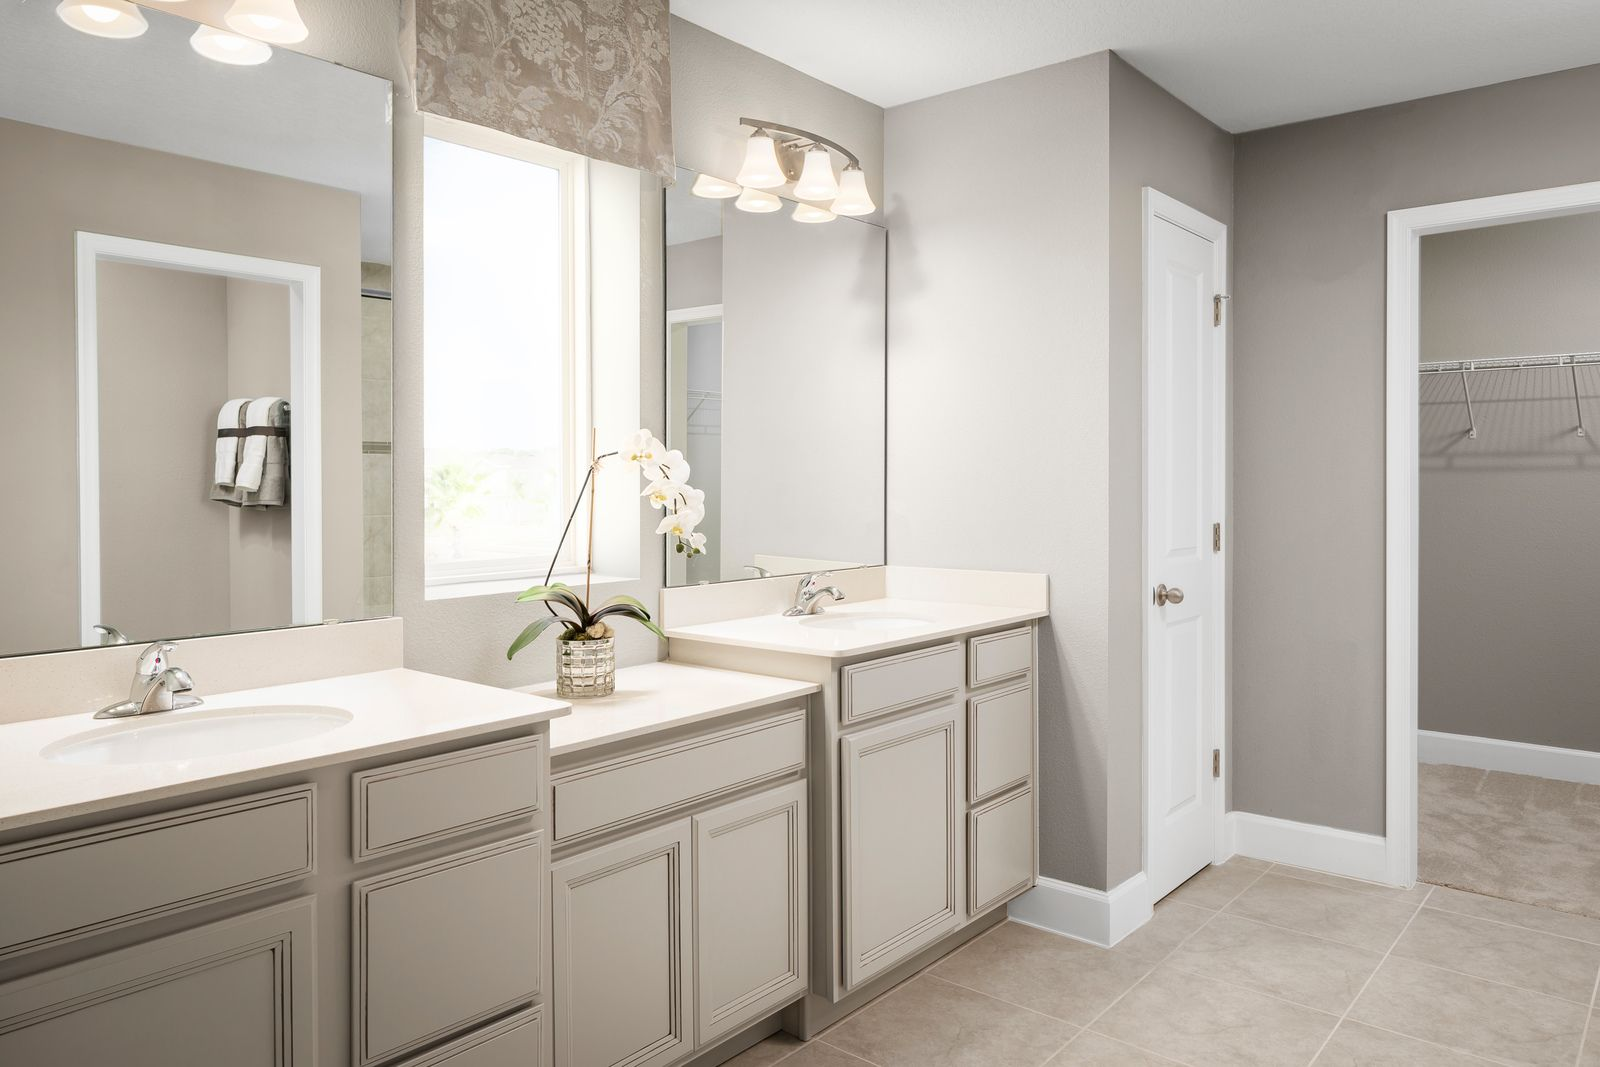 Bathroom featured in the Hadley Bay By Ryan Homes in Orlando, FL